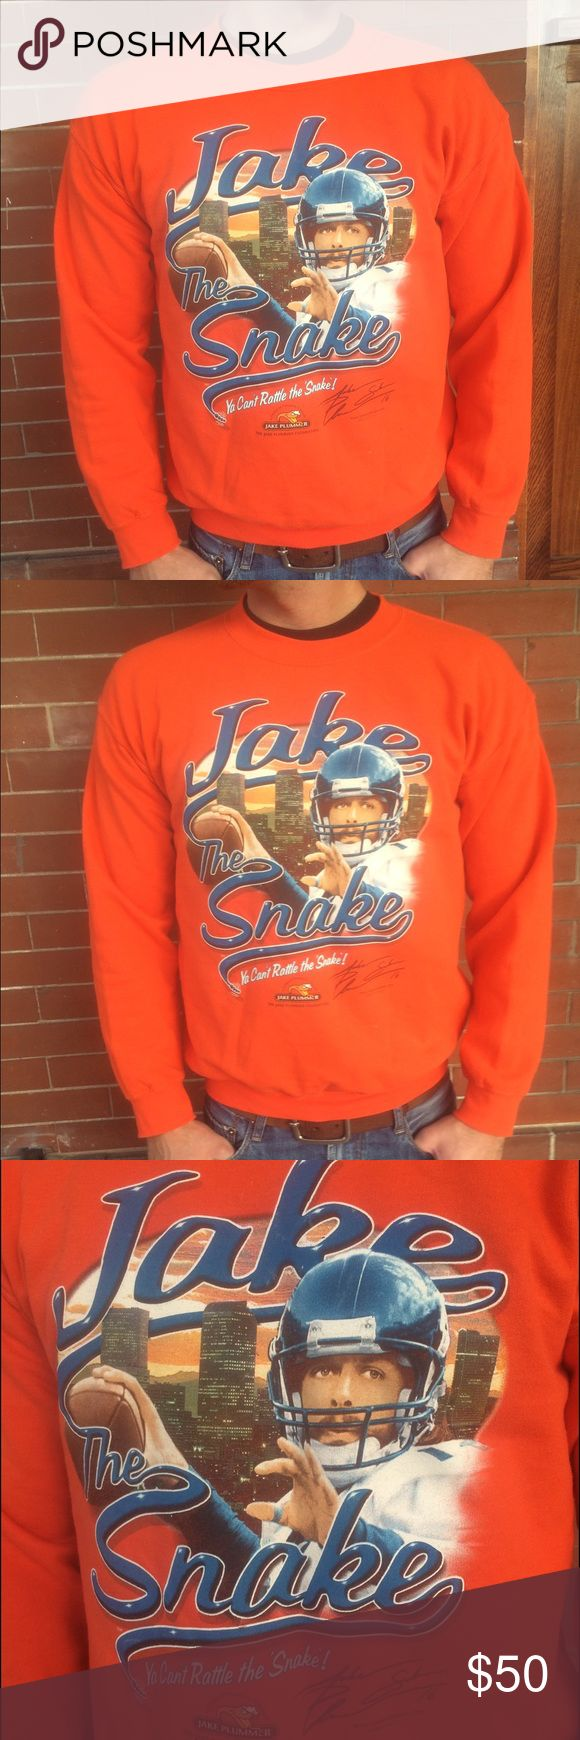 Denver Broncos Jake Plummer Sweatshirt Rare 2005 🏉Denver Broncos Jake Plummer Sweatshirt.  Ya can't rattle the 'snake' 🐍Excellent condition.  Denver city skyline 🌇in background, vibrant color. Cotton poly blend.  Size Men's mediumship ♏️. Can be unisex. Sweaters